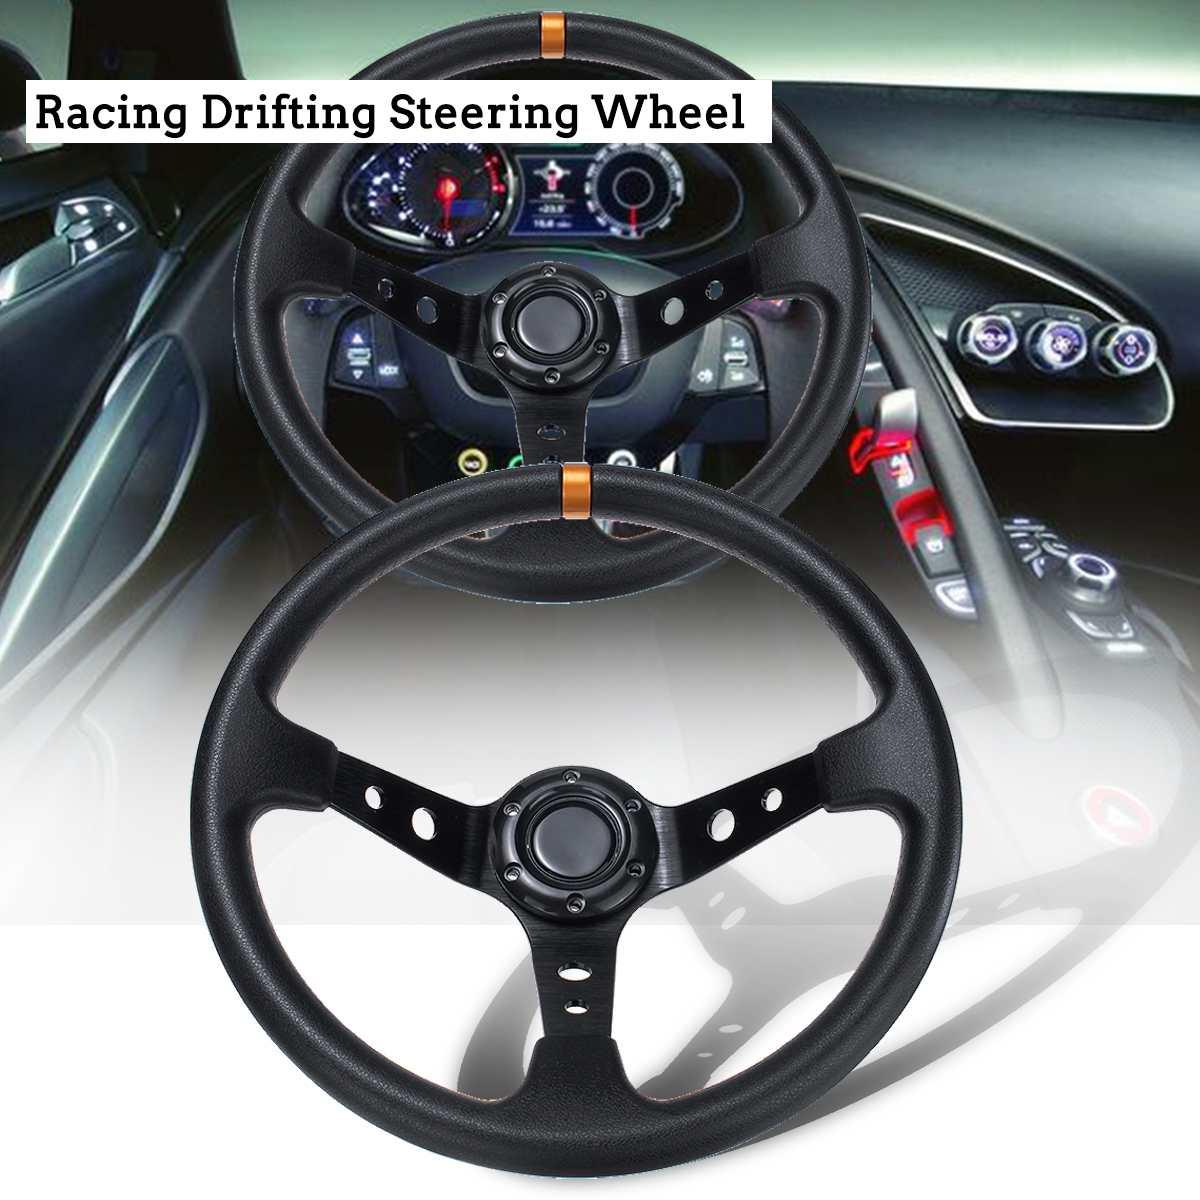 Auto Racing Lenkrad Drift Auto Sport Lenkrad 14 zoll 350mm PU & Aluminium Universal Tief Corn Dish geändert Teile